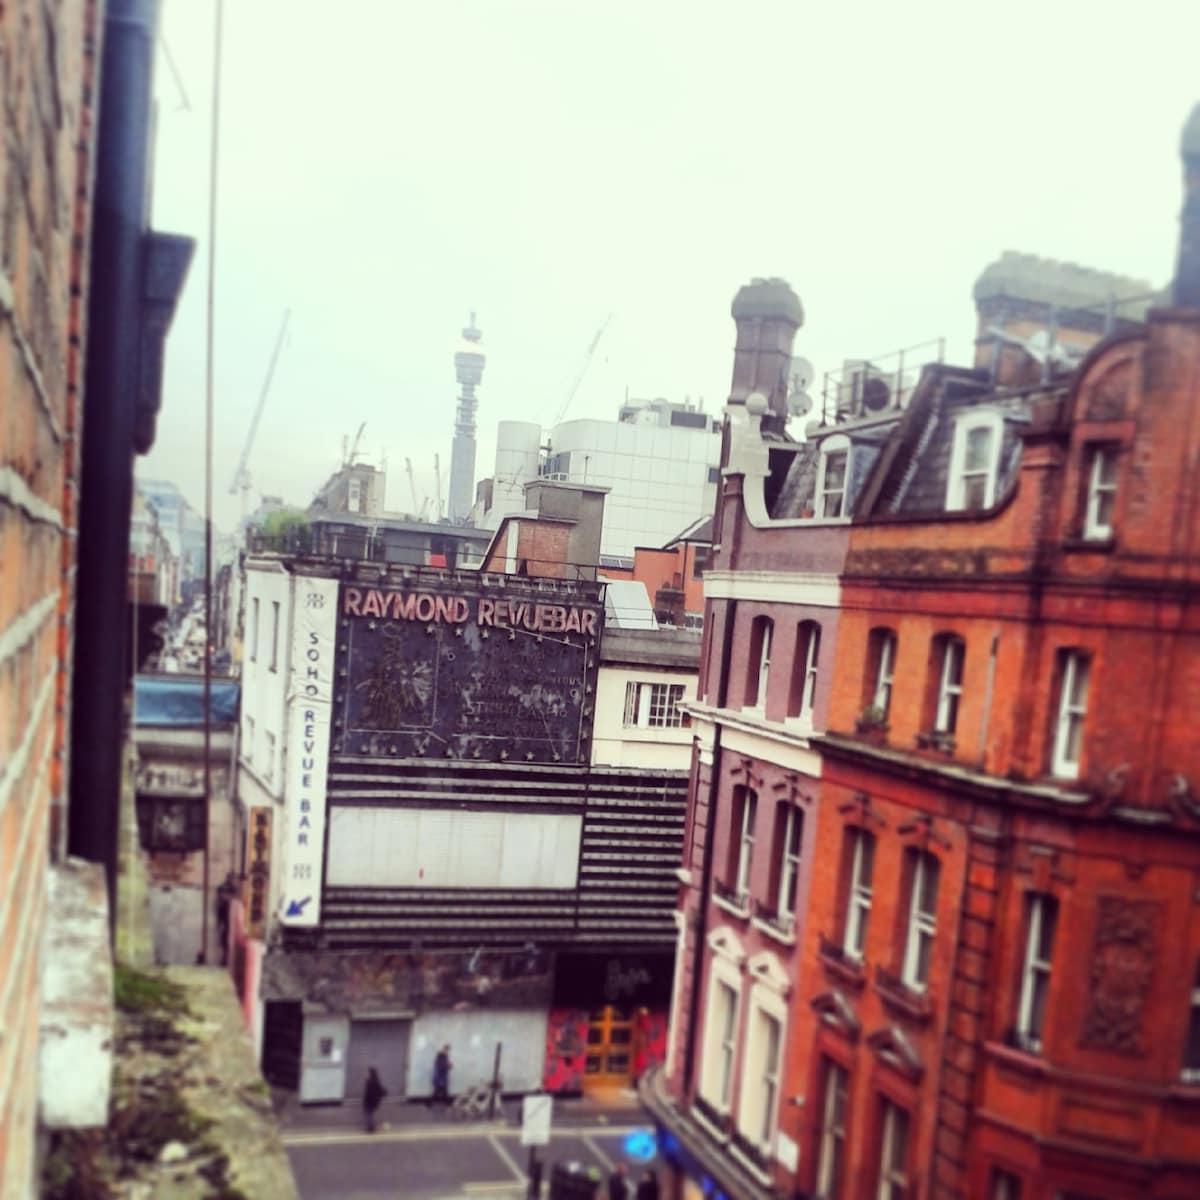 Bedsit studio by Soho/Piccadilly